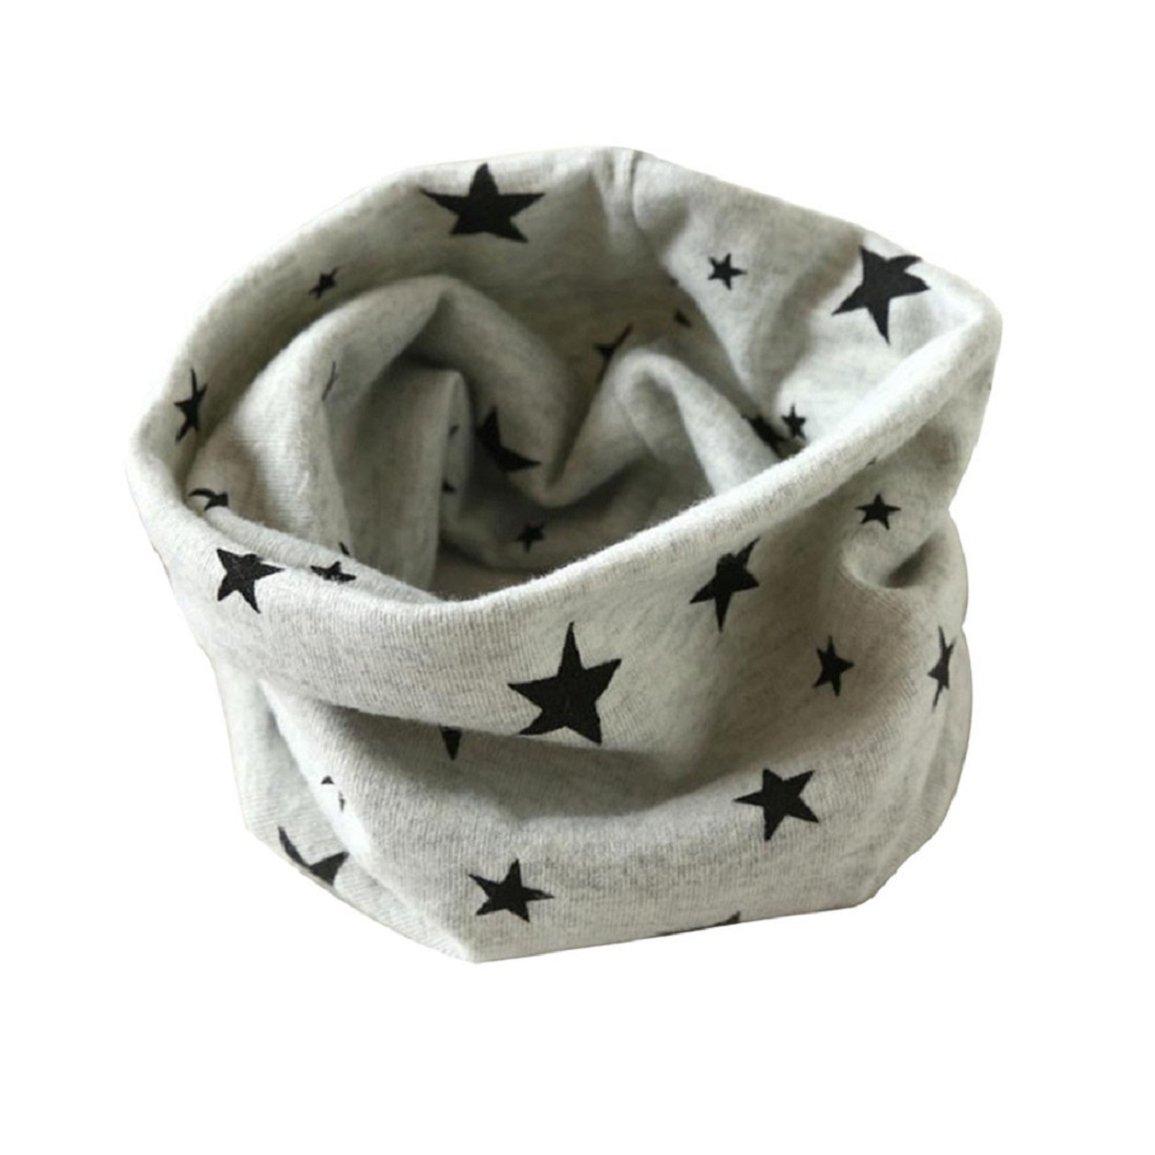 Changeshopping Autumn Winter Boys Girls Collar Baby Scarf Cotton O Ring Neck Scarves (Purple)